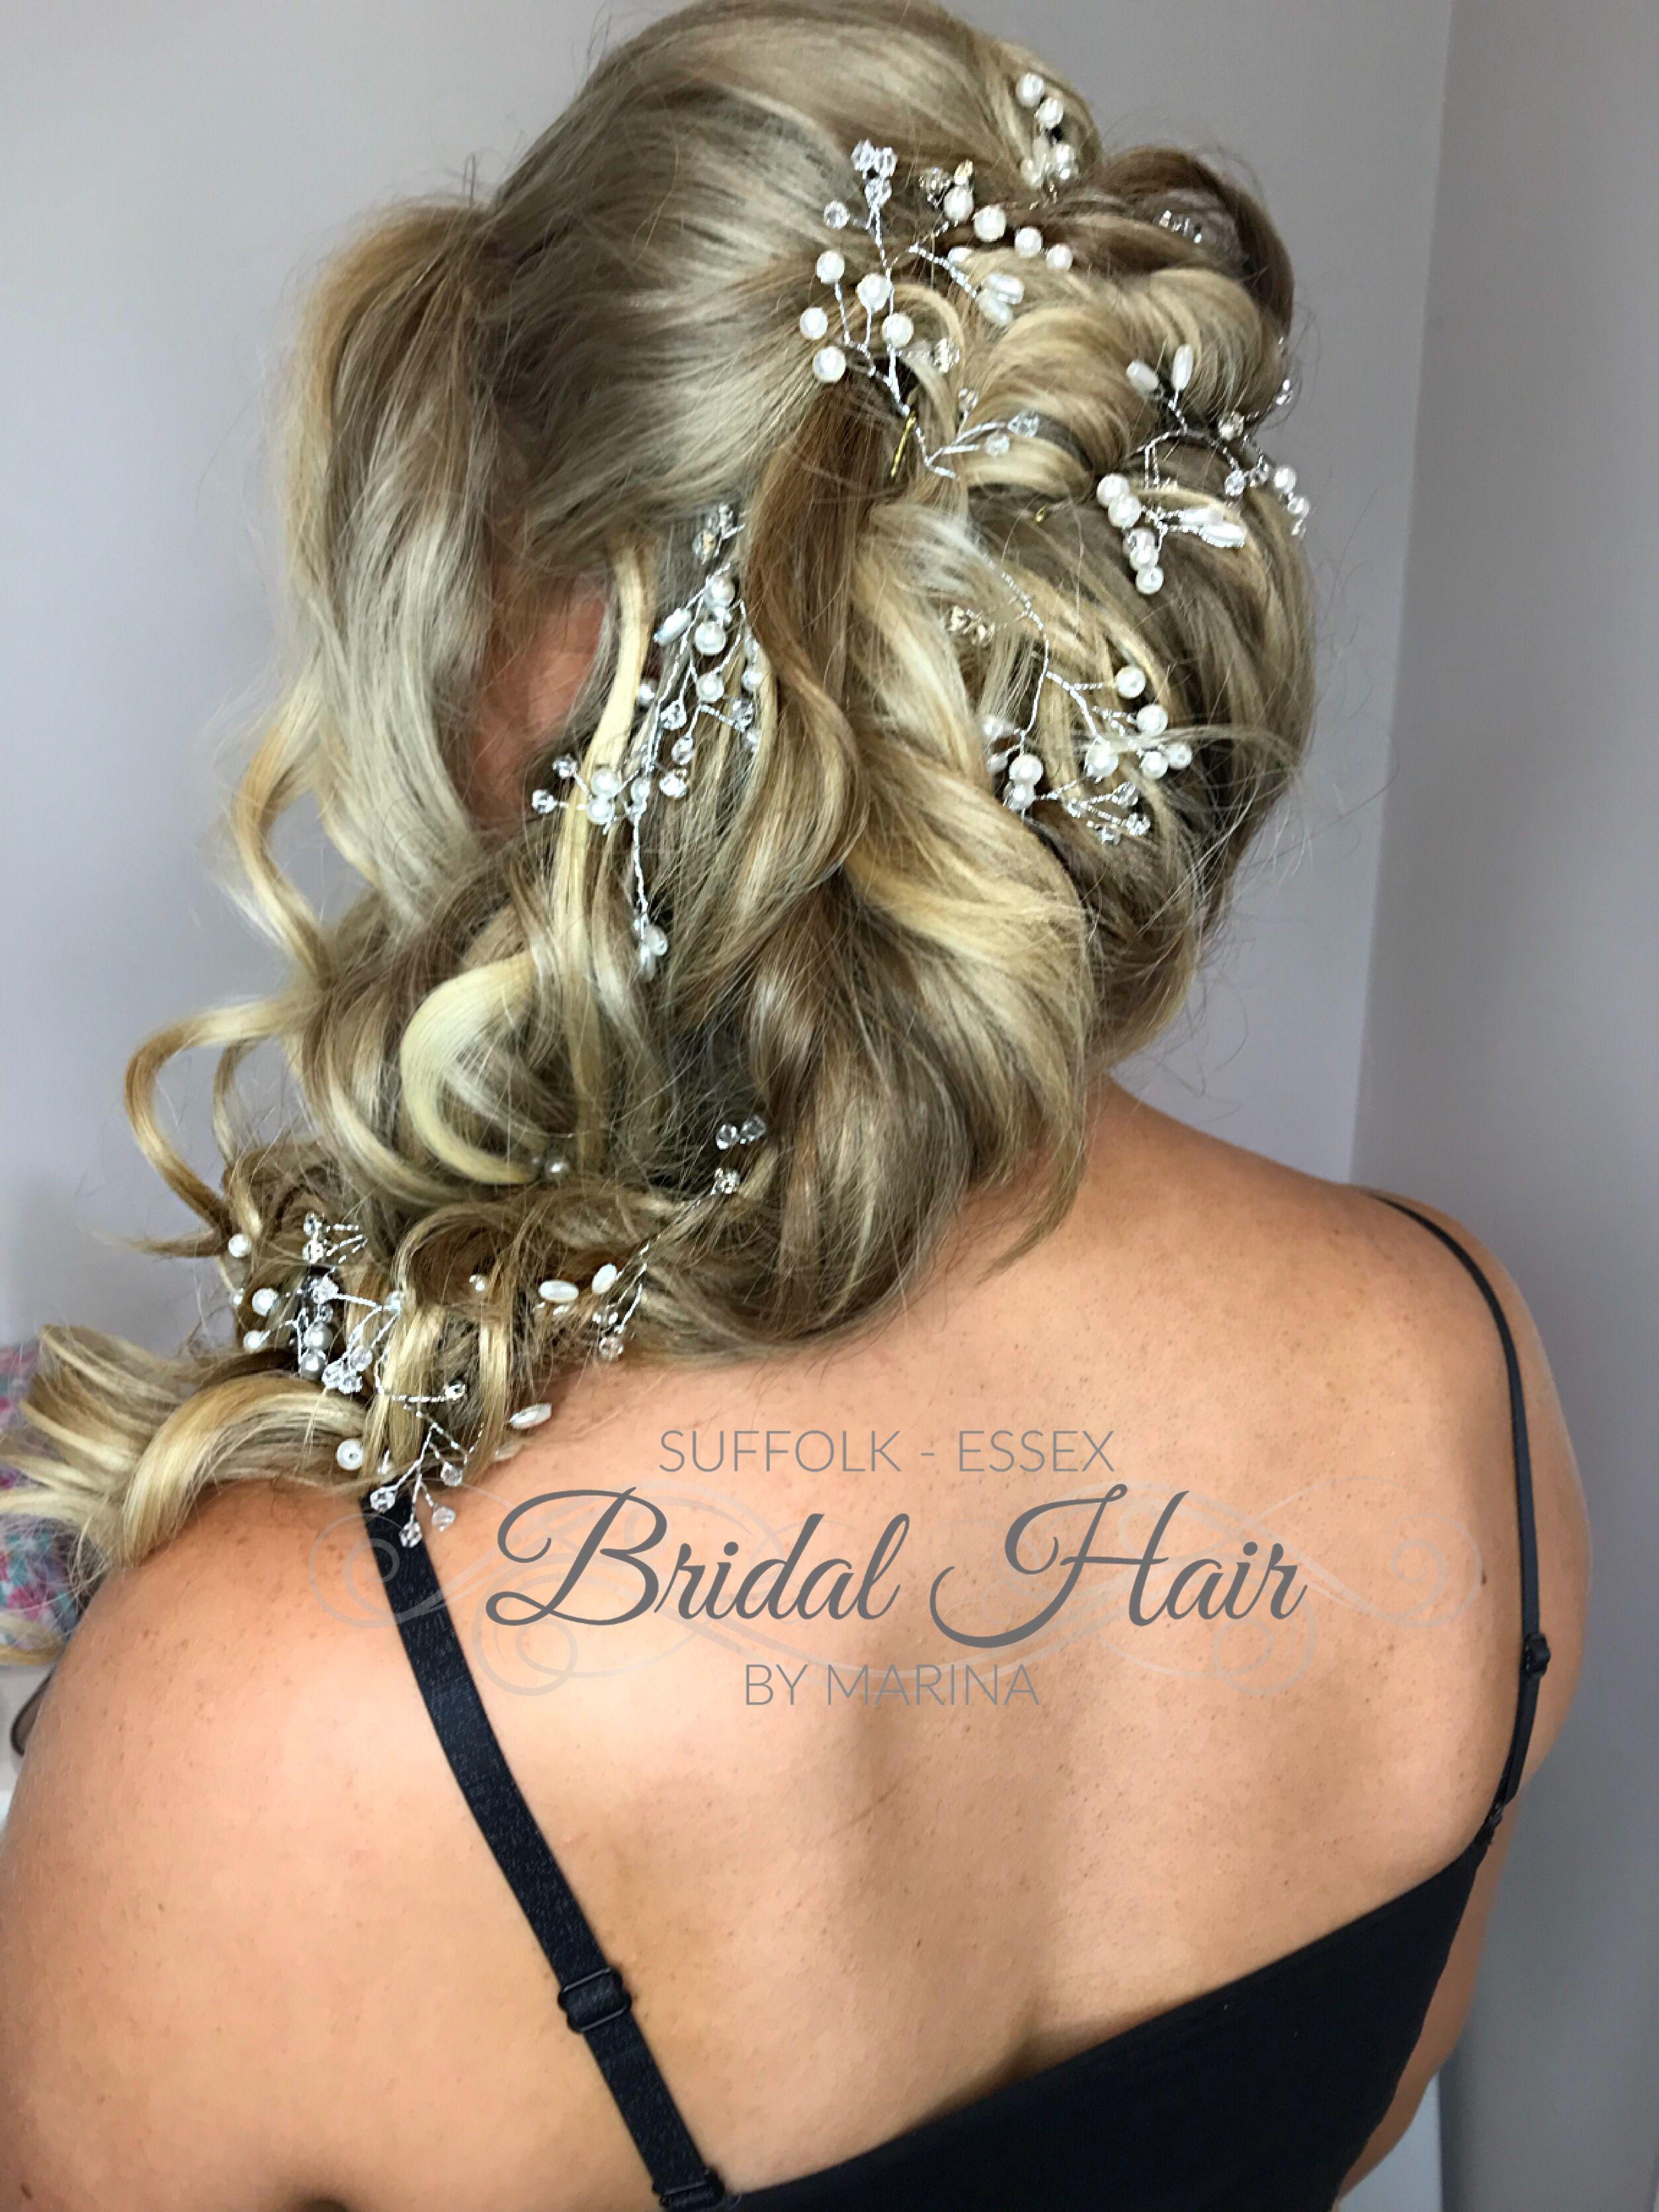 wedding/ bridesmaids hairstyles with volume | hair